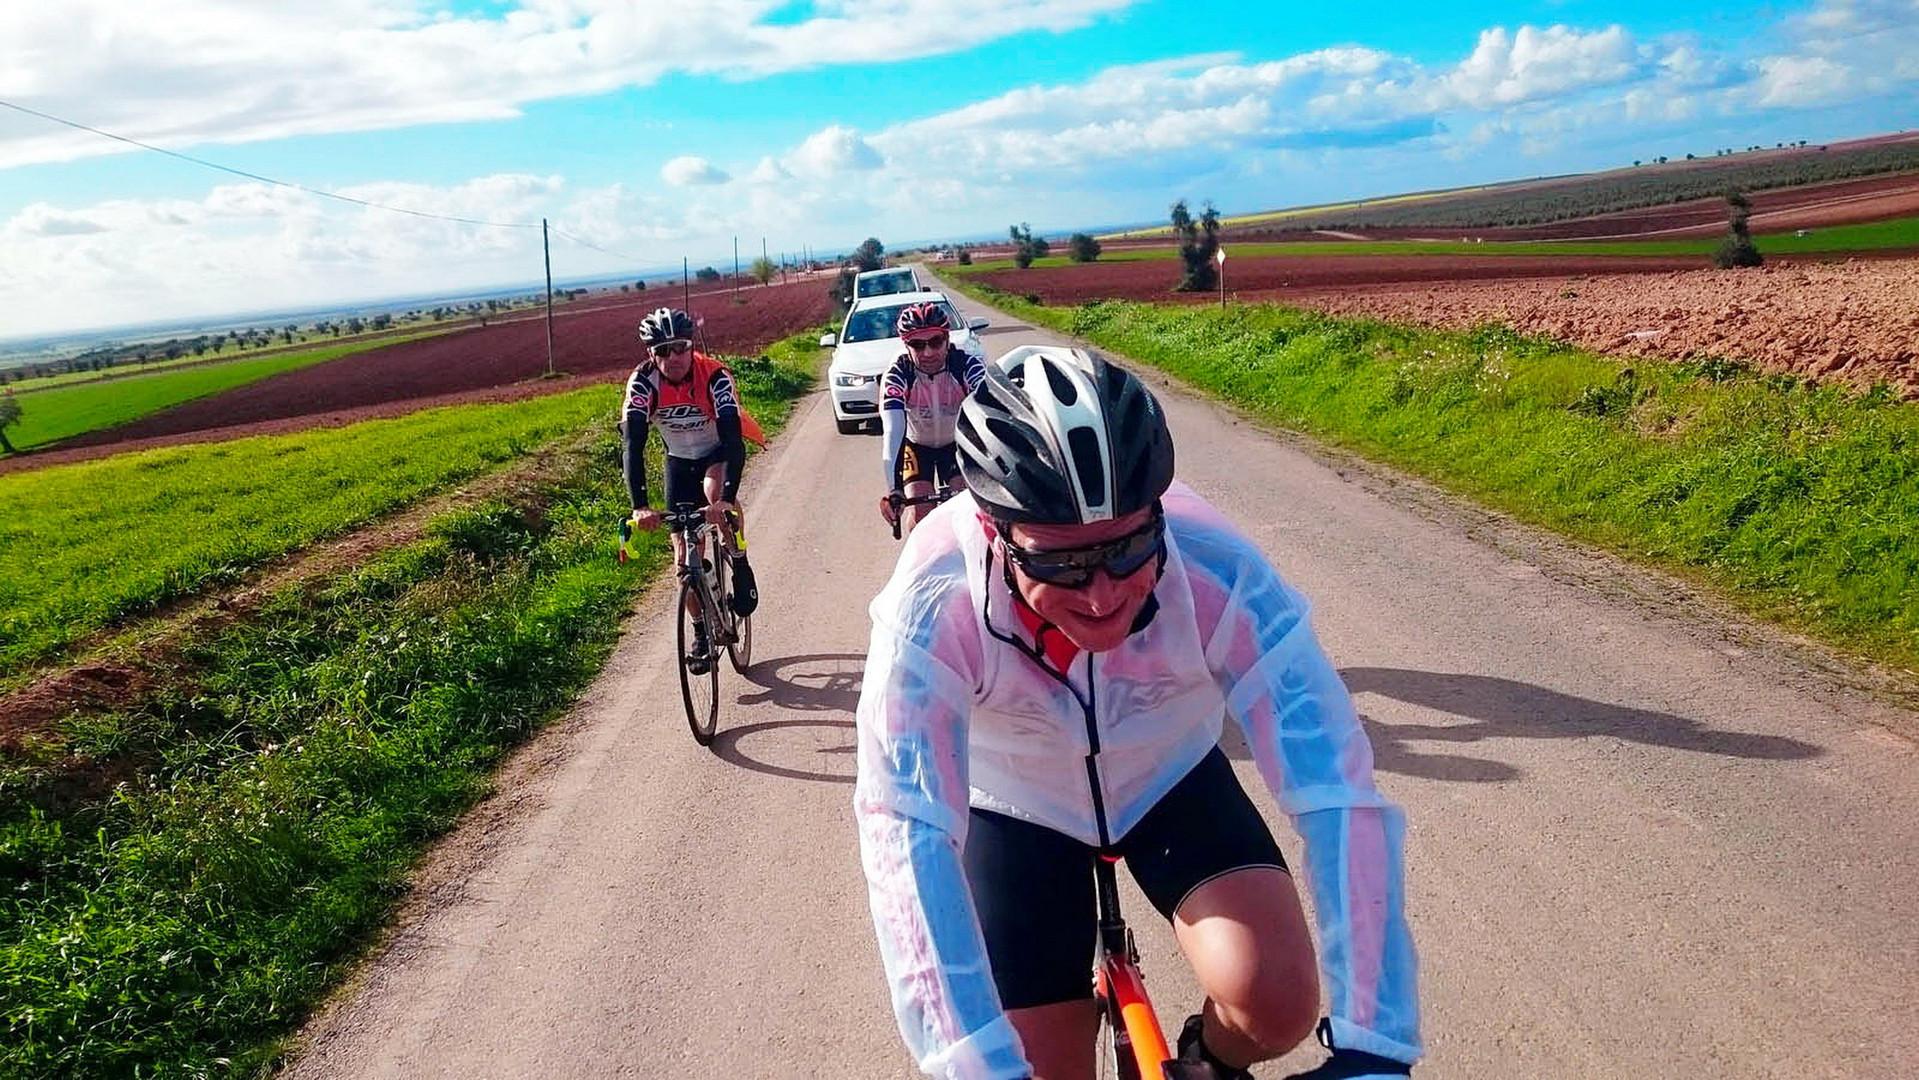 bike-tours-algarve-alg-ale_6.jpg